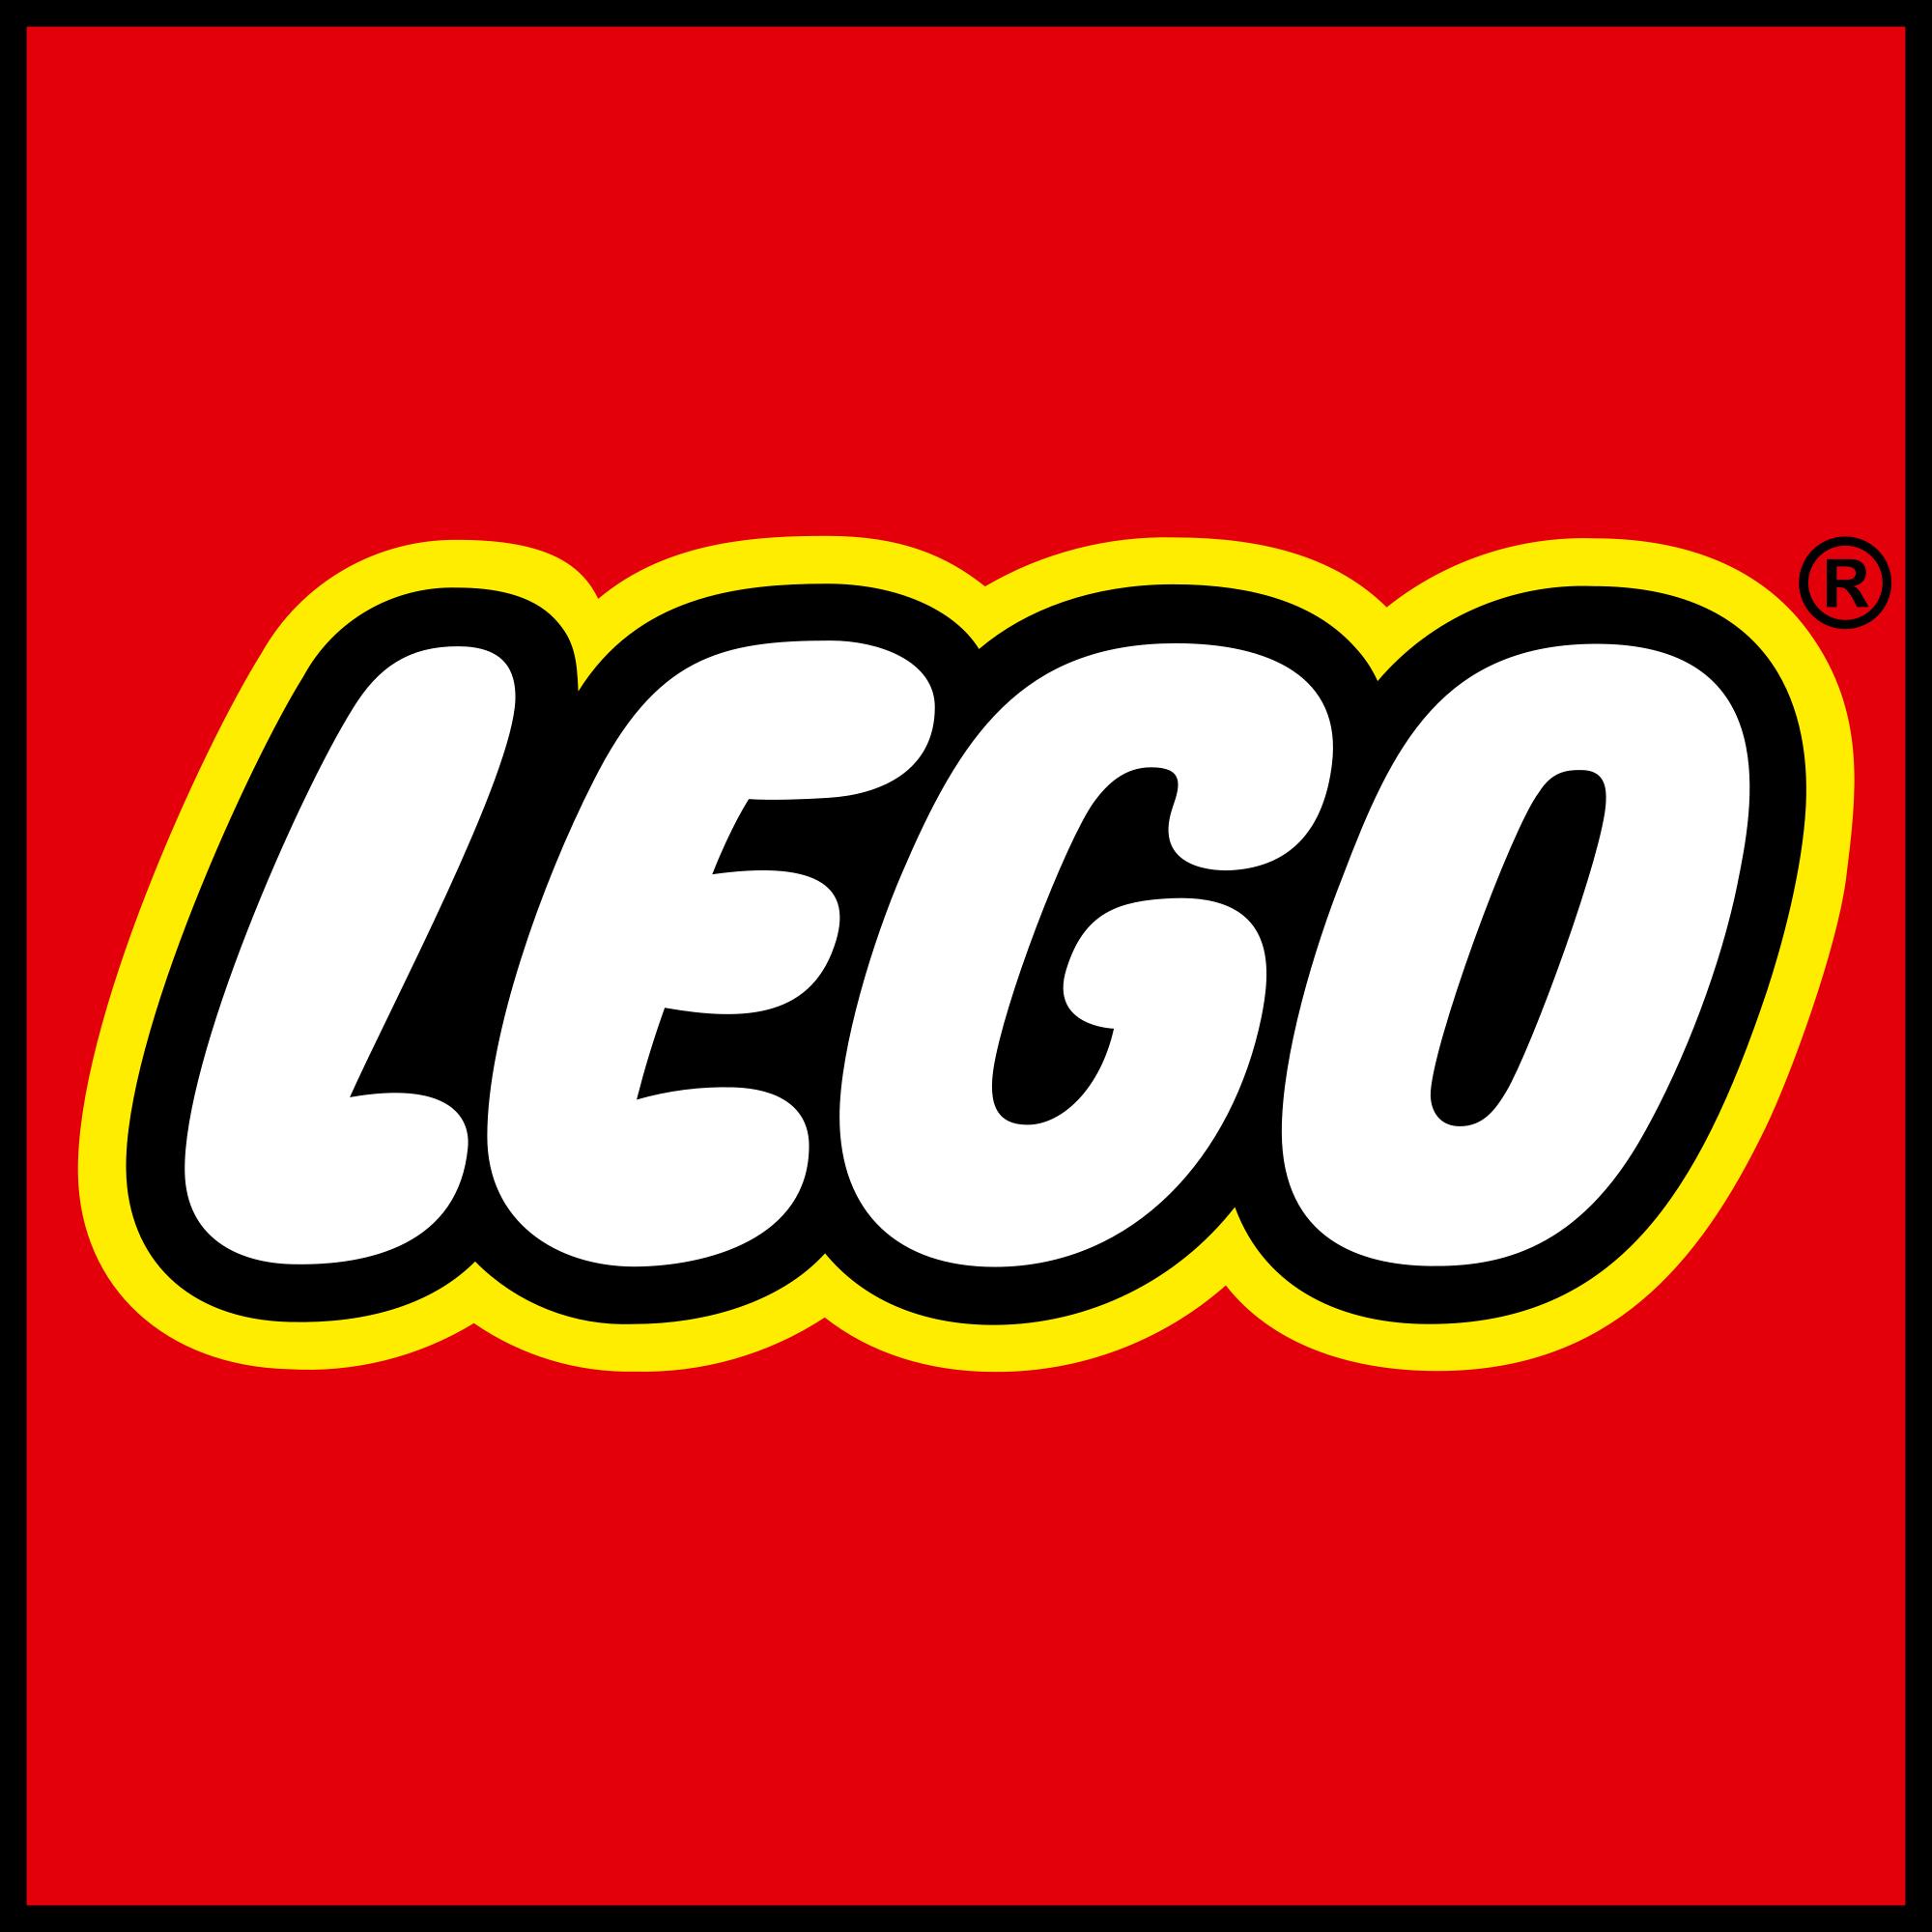 Vice President, LEGO